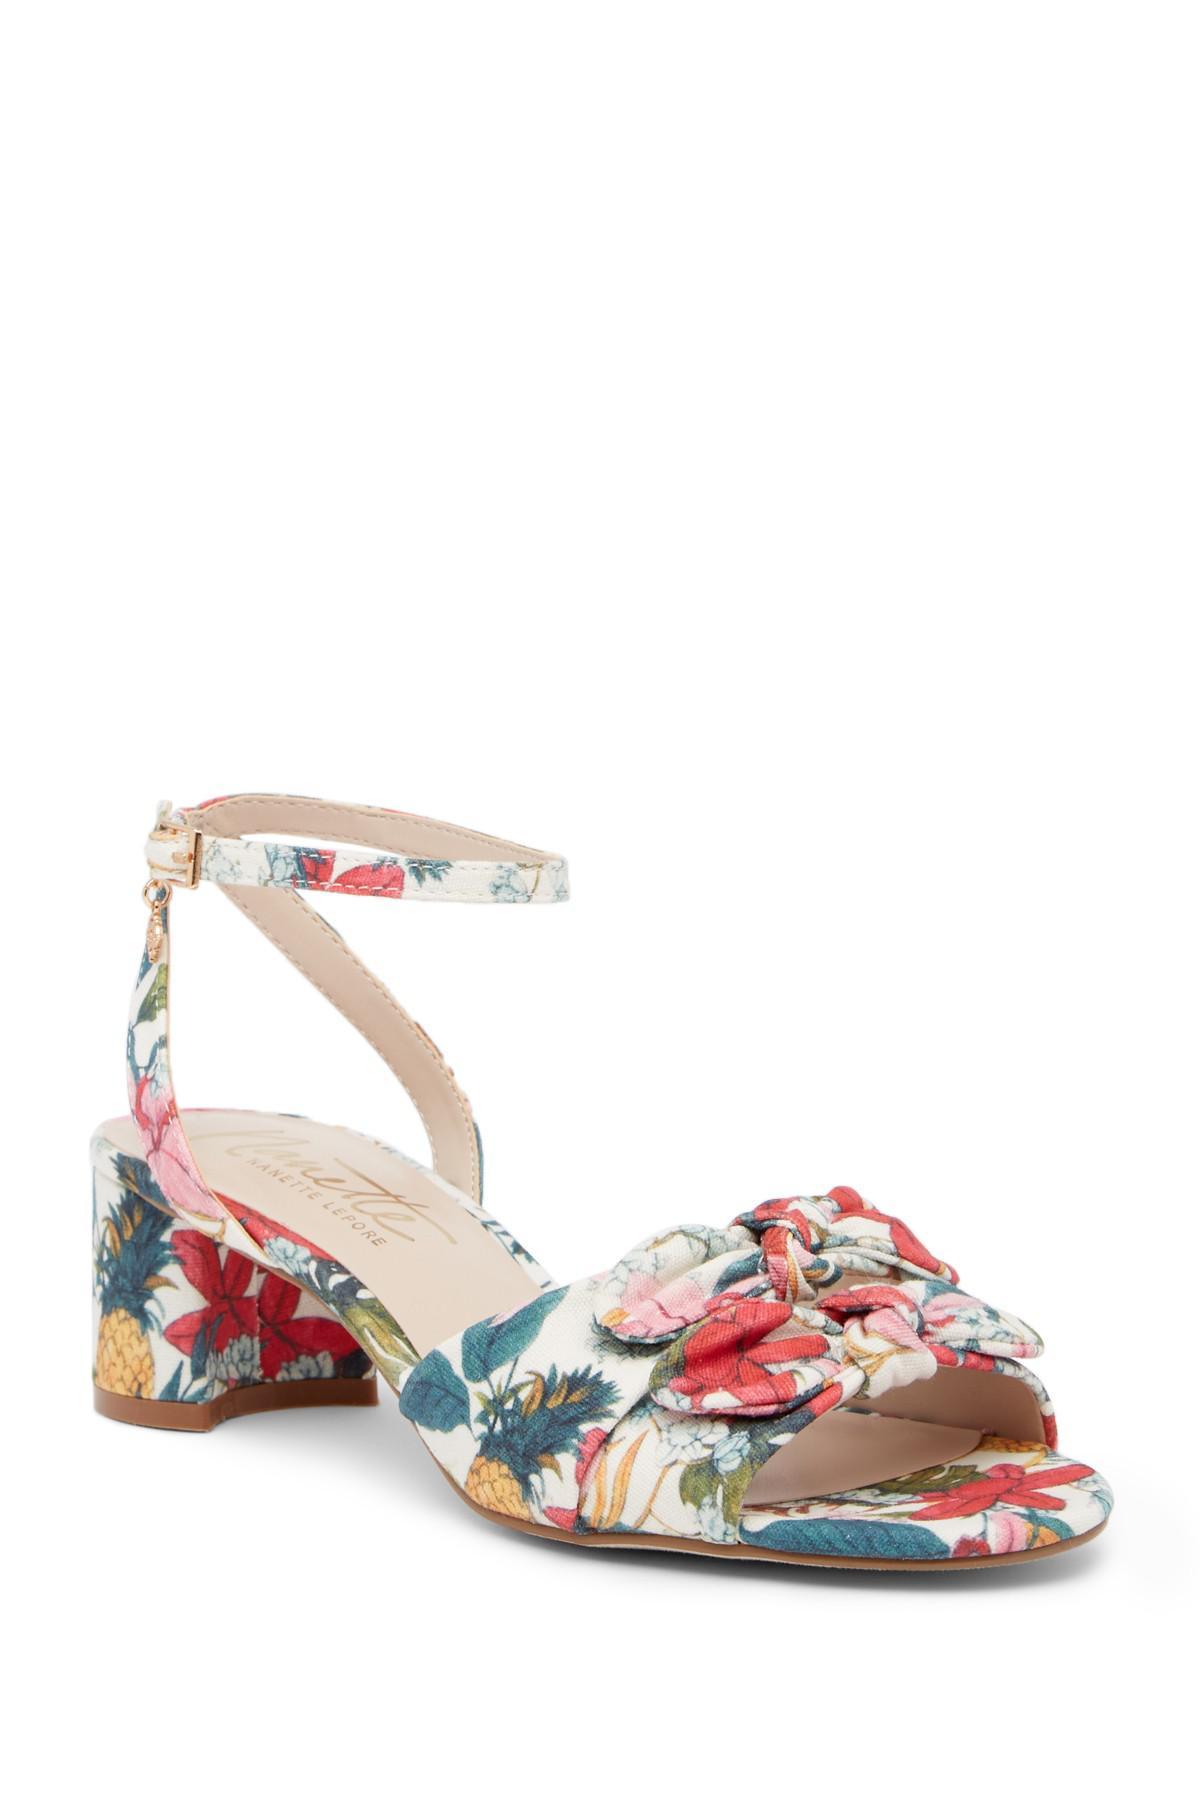 NANETTE nanette lepore Thora Floral Ankle Strap Sandal 5UpUc